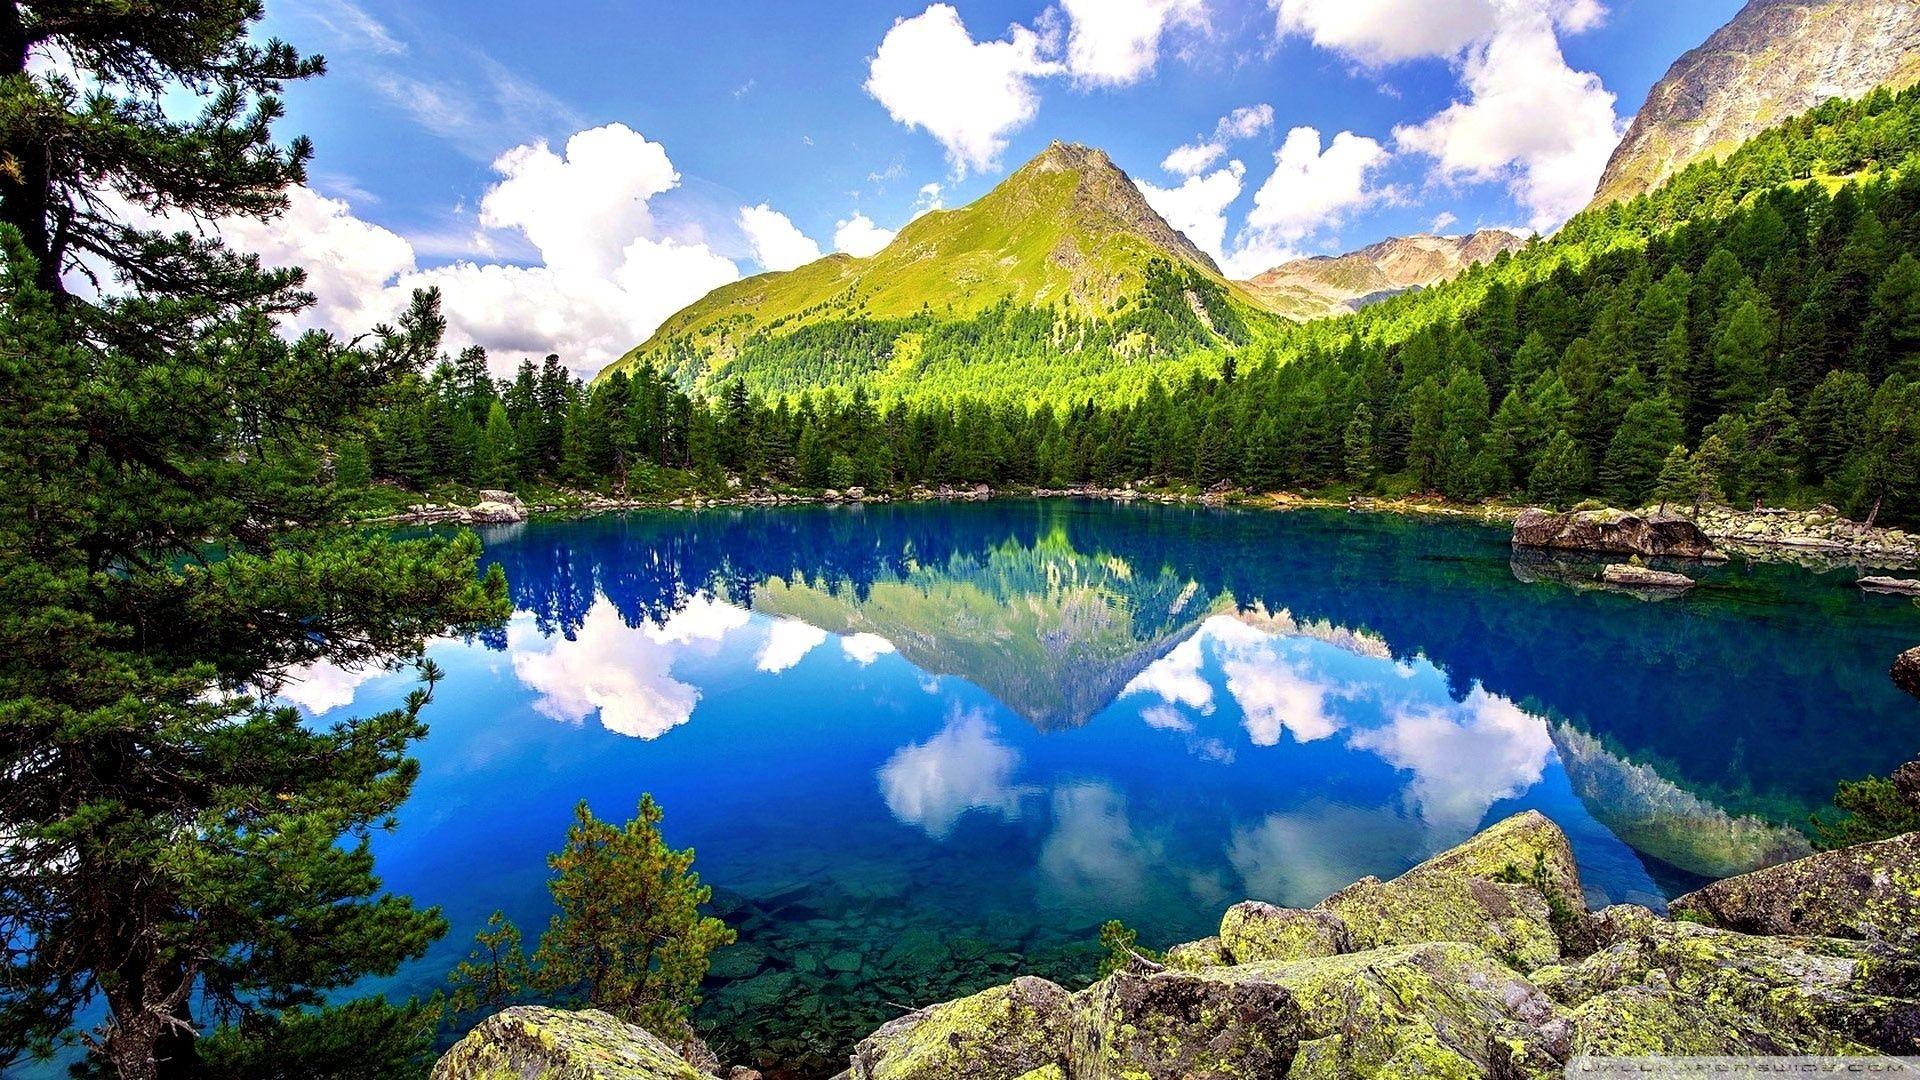 Res: 1920x1080, Spring Mountain Landscape HD desktop wallpaper : High Definition